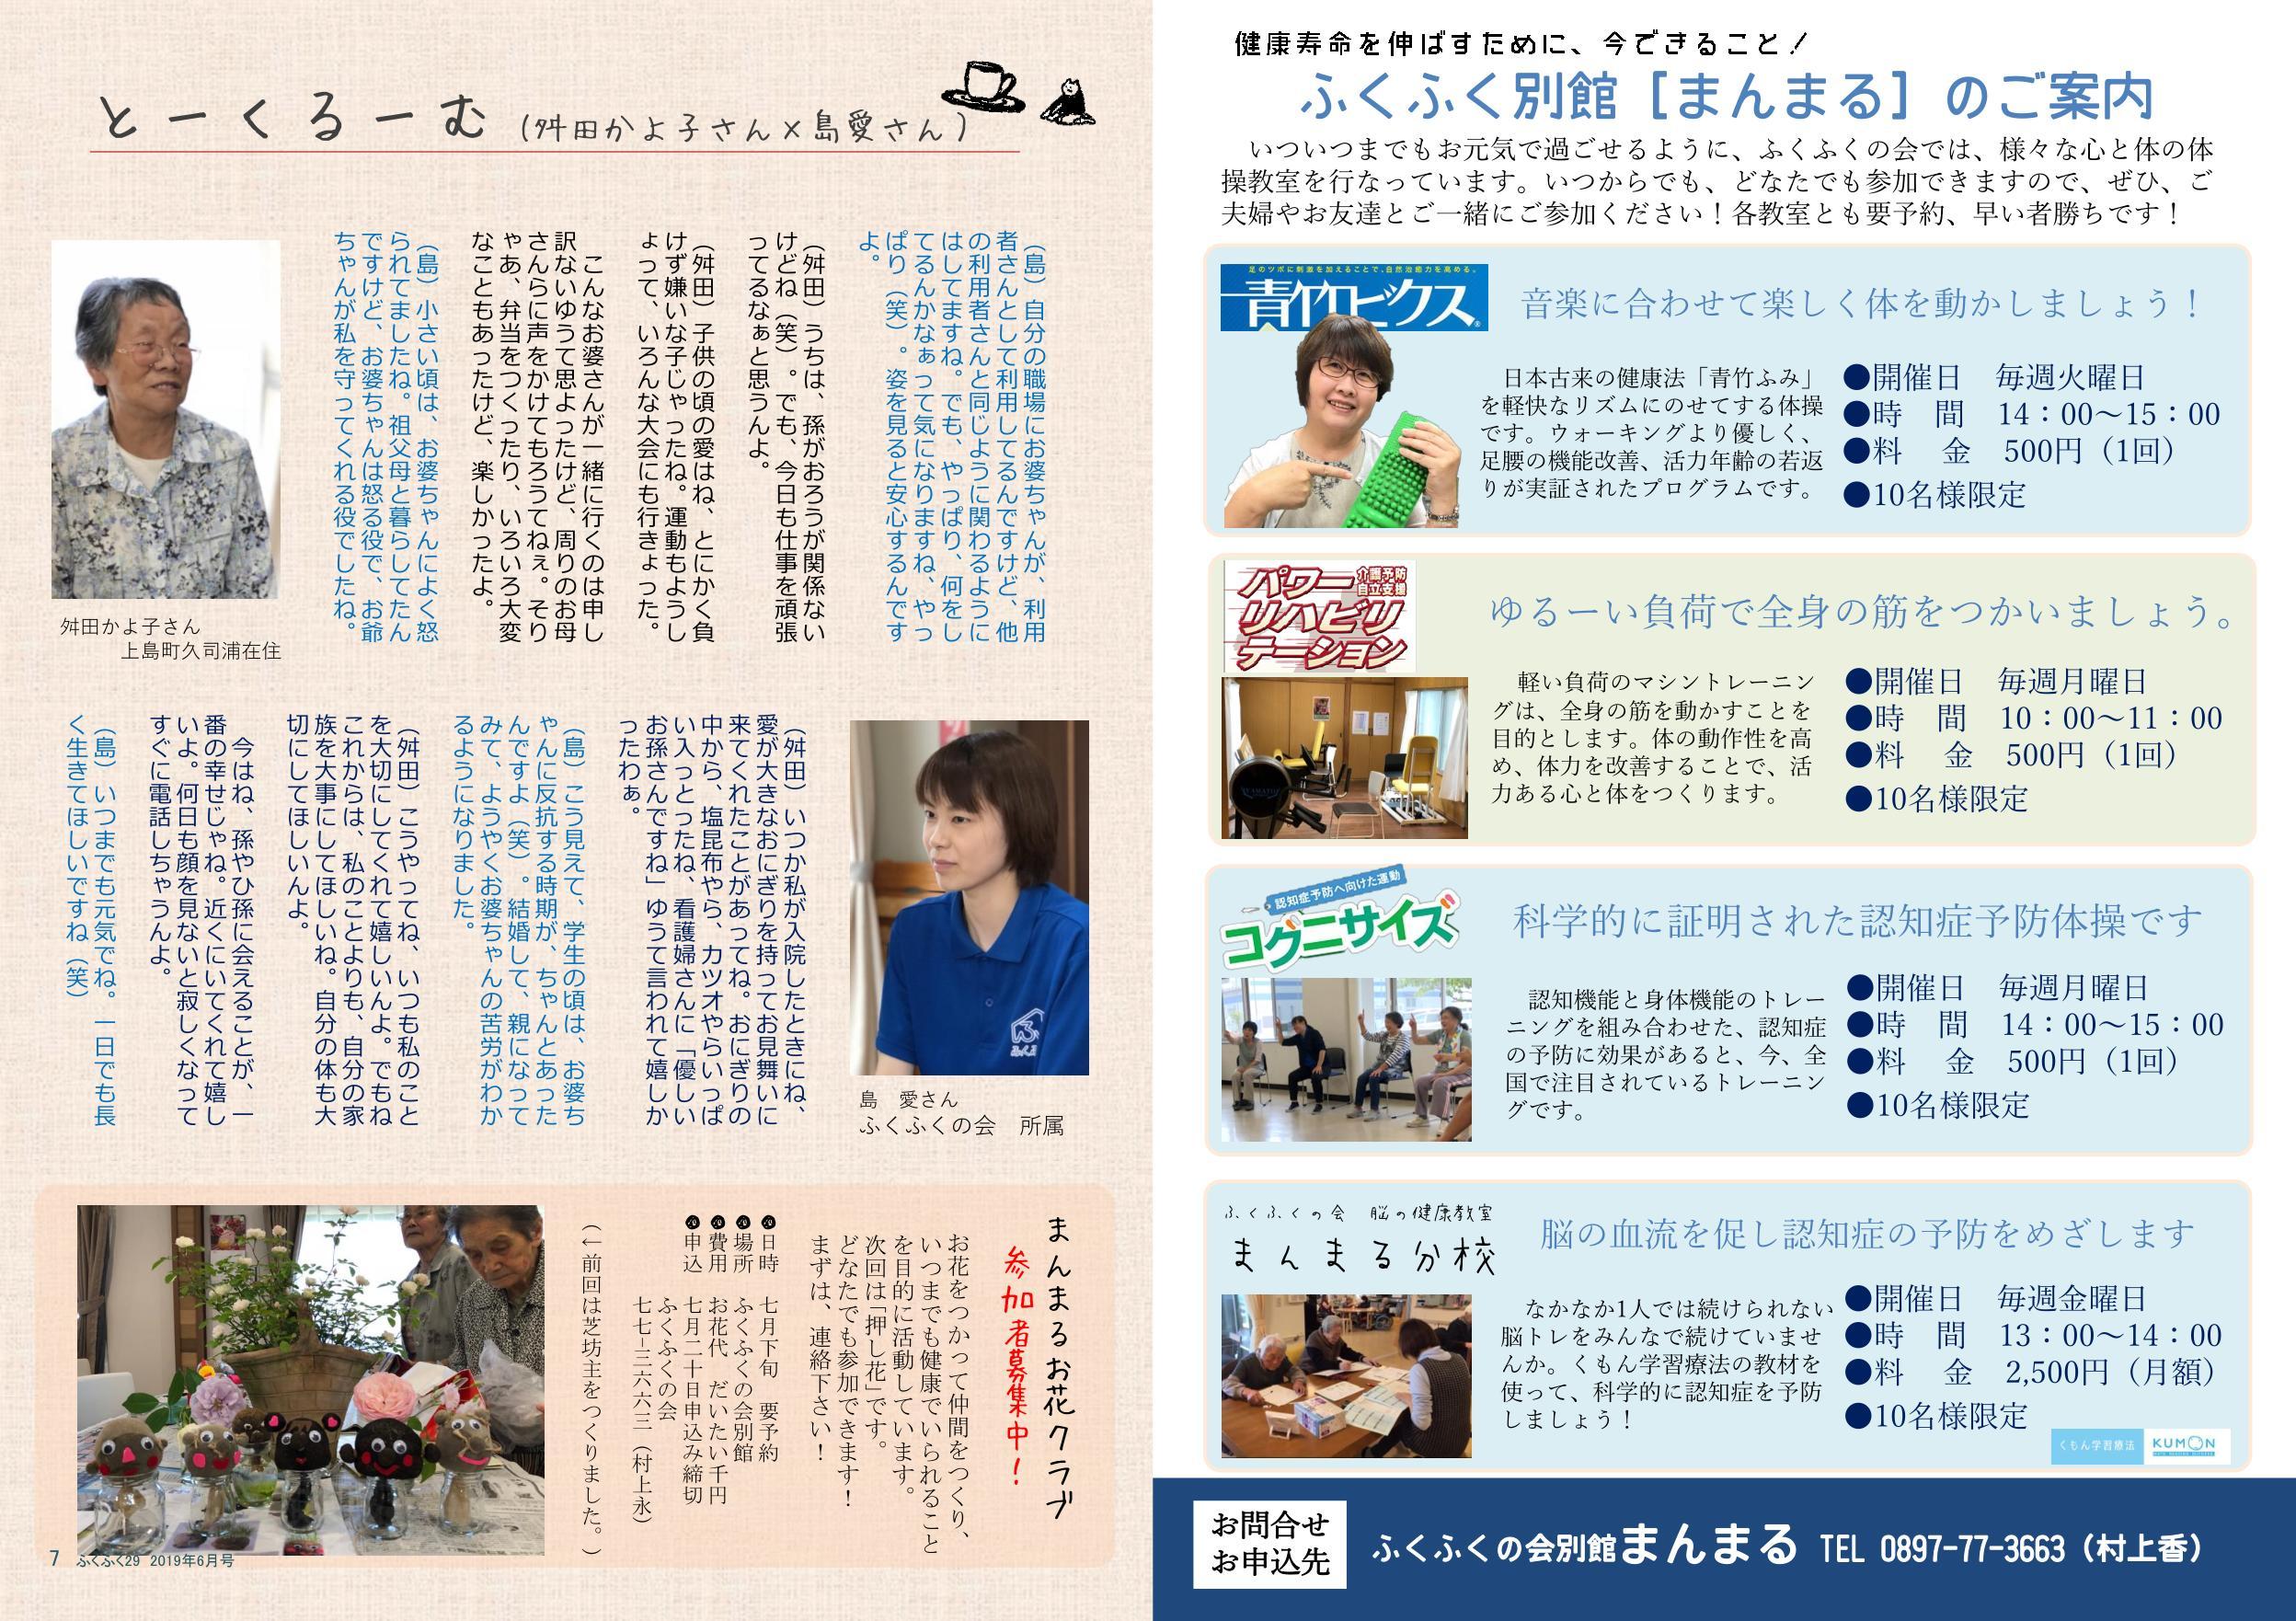 http://fukufukunokai.com/newsletter/images/%E3%81%B5%E3%81%8F%E3%81%B5%E3%81%8F29%E3%80%802019%E3%80%806%E6%9C%88%E5%8F%B7_cropped_4.jpeg